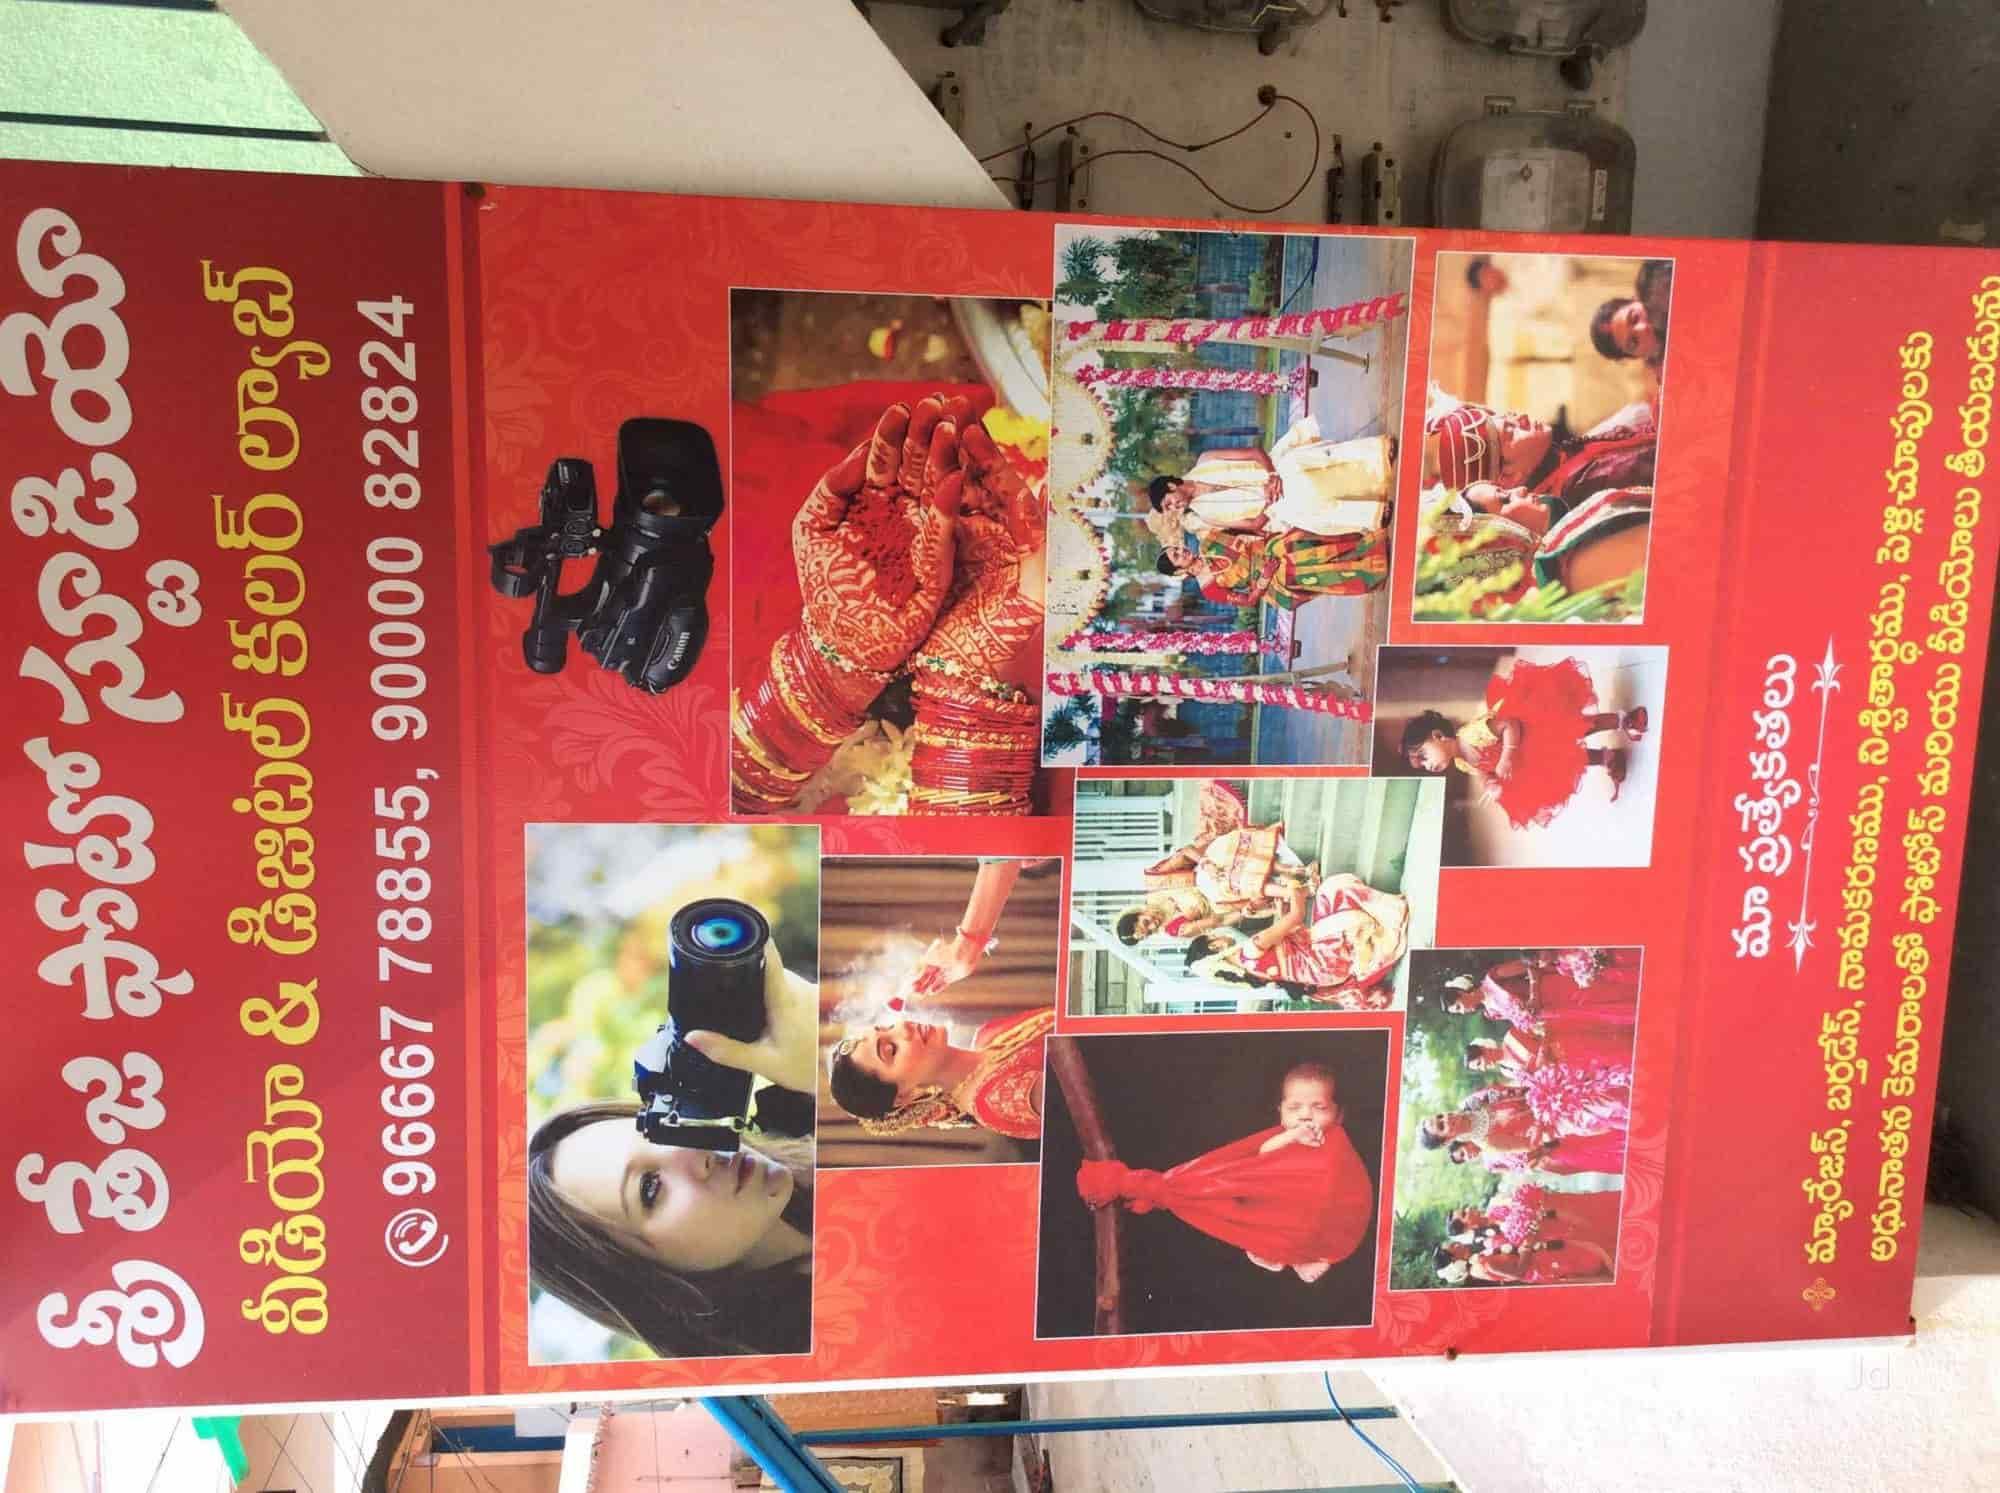 Sri Theja Digital Photo Studio, Tilak Road  Photo Studios